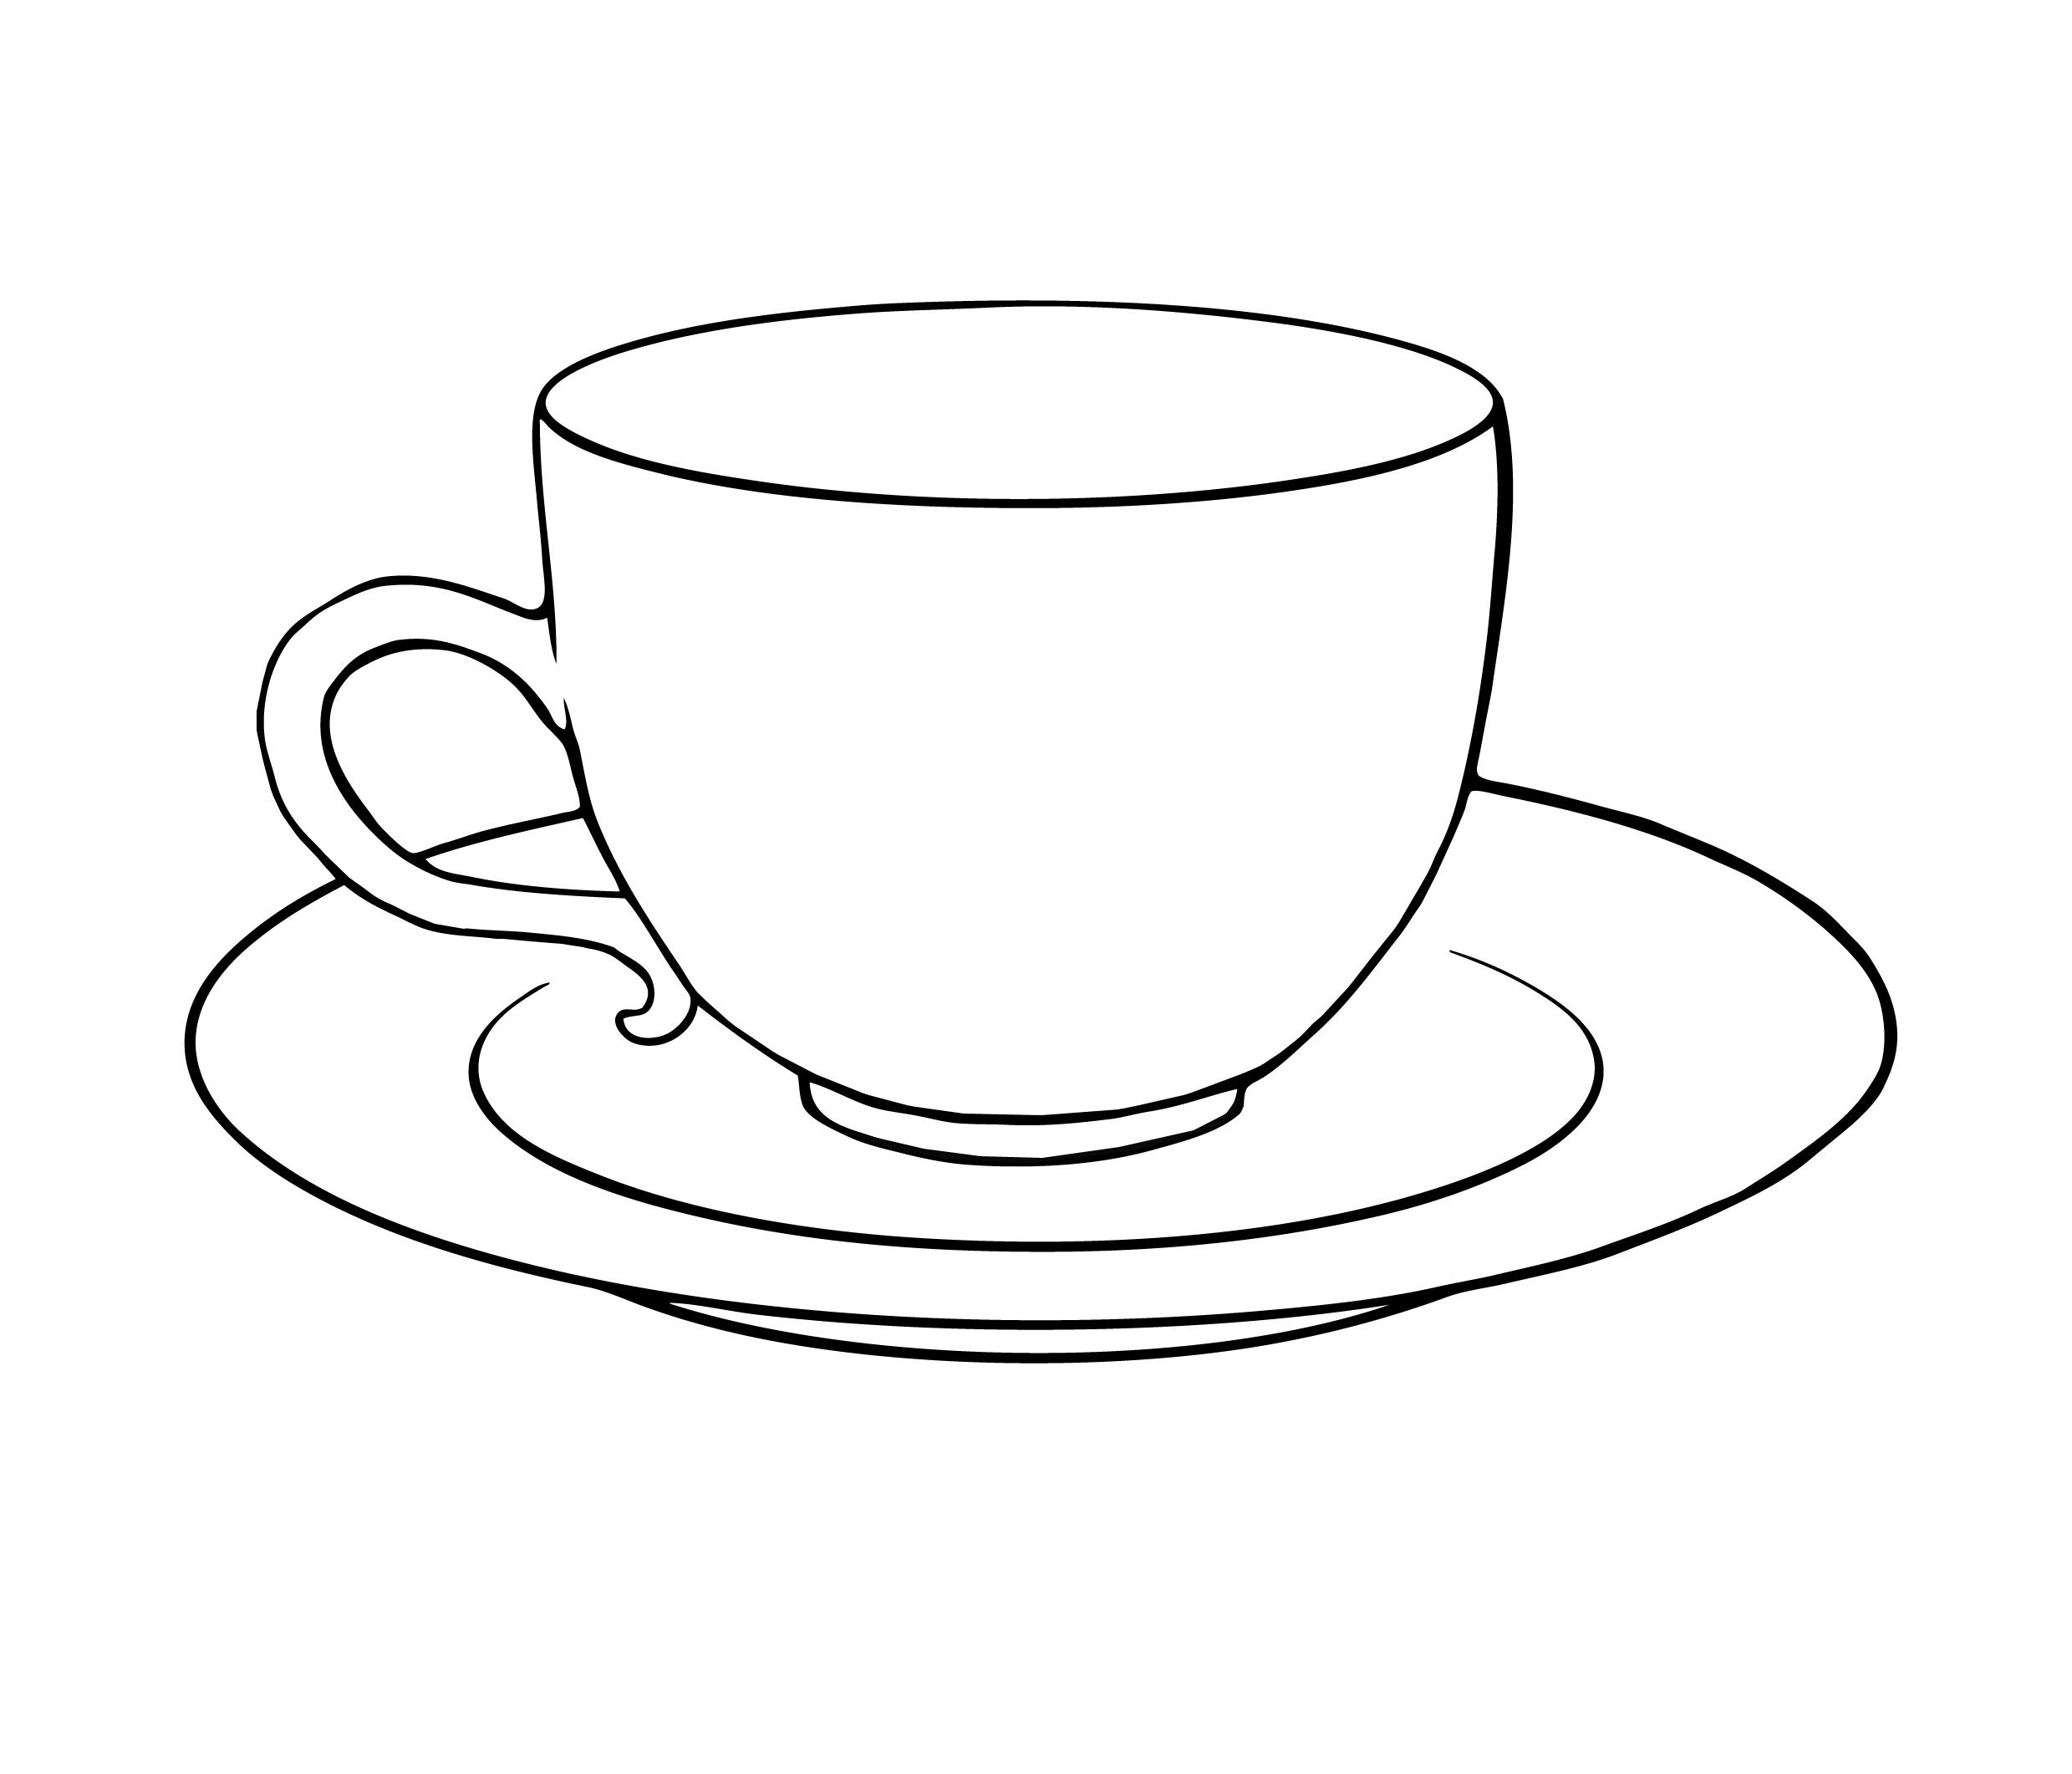 Tea Cup coloring #20, Download drawings